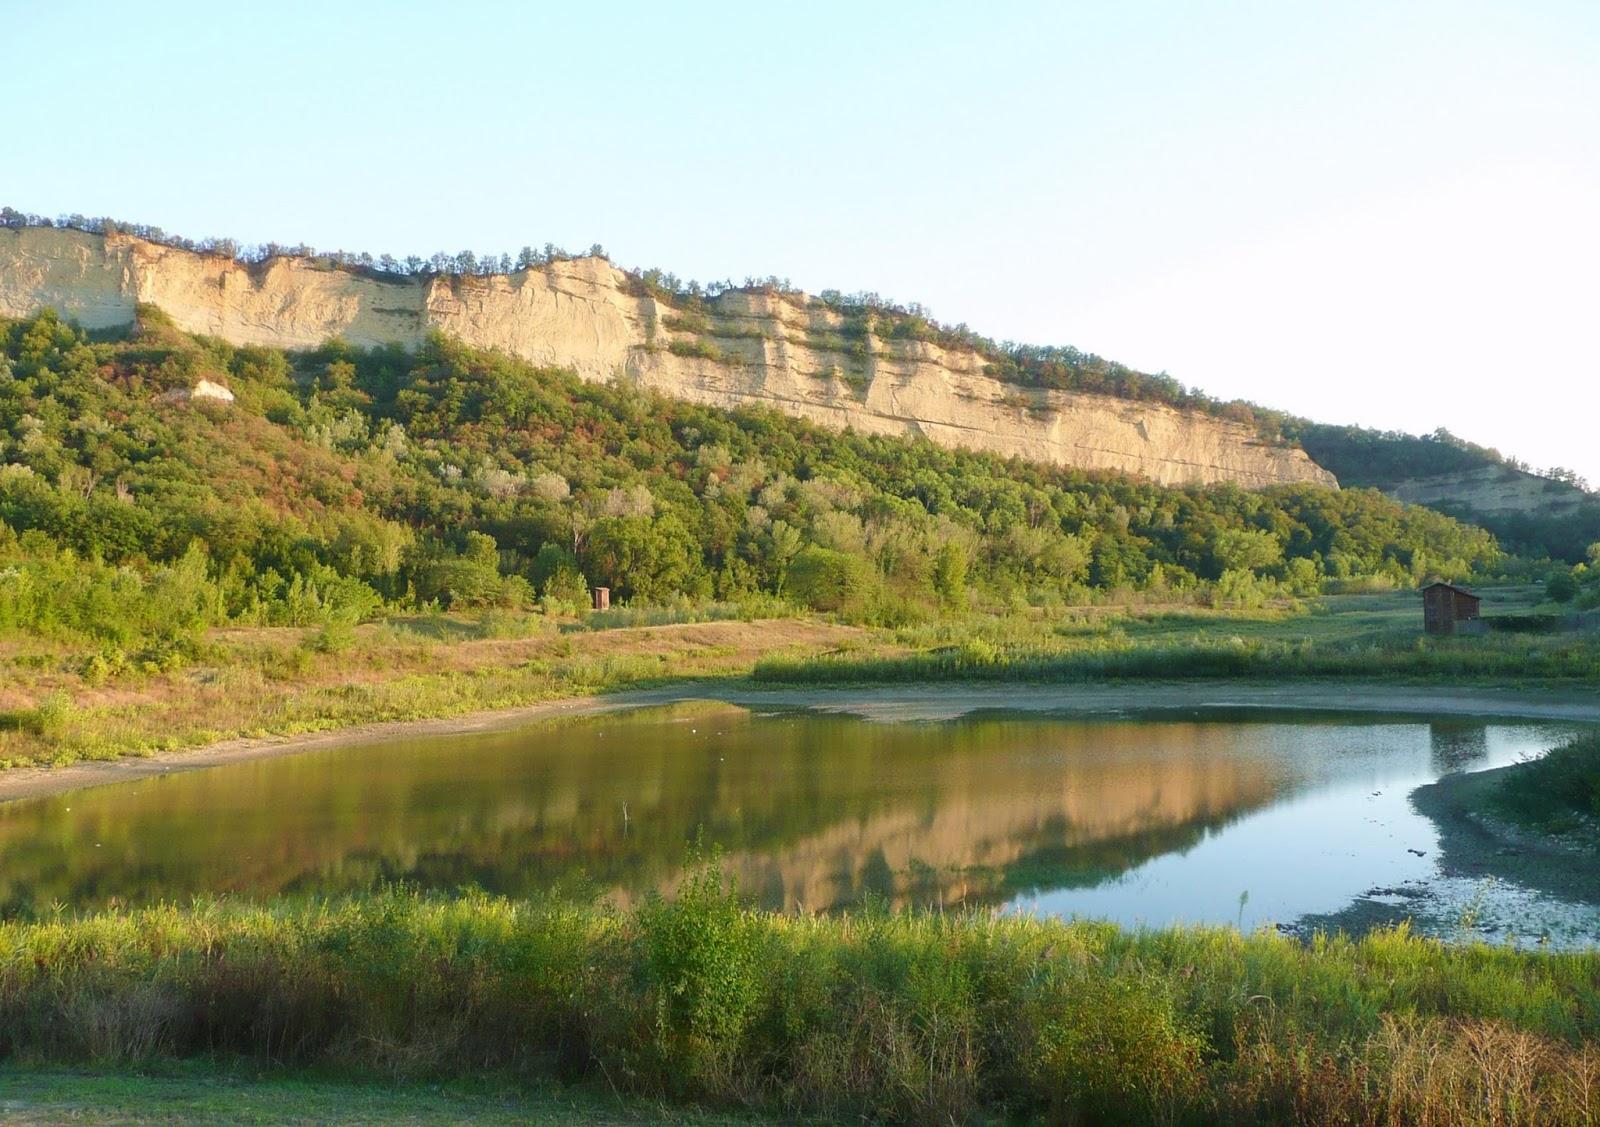 Visita guidata all'Oasi naturalistica di San Gherardo